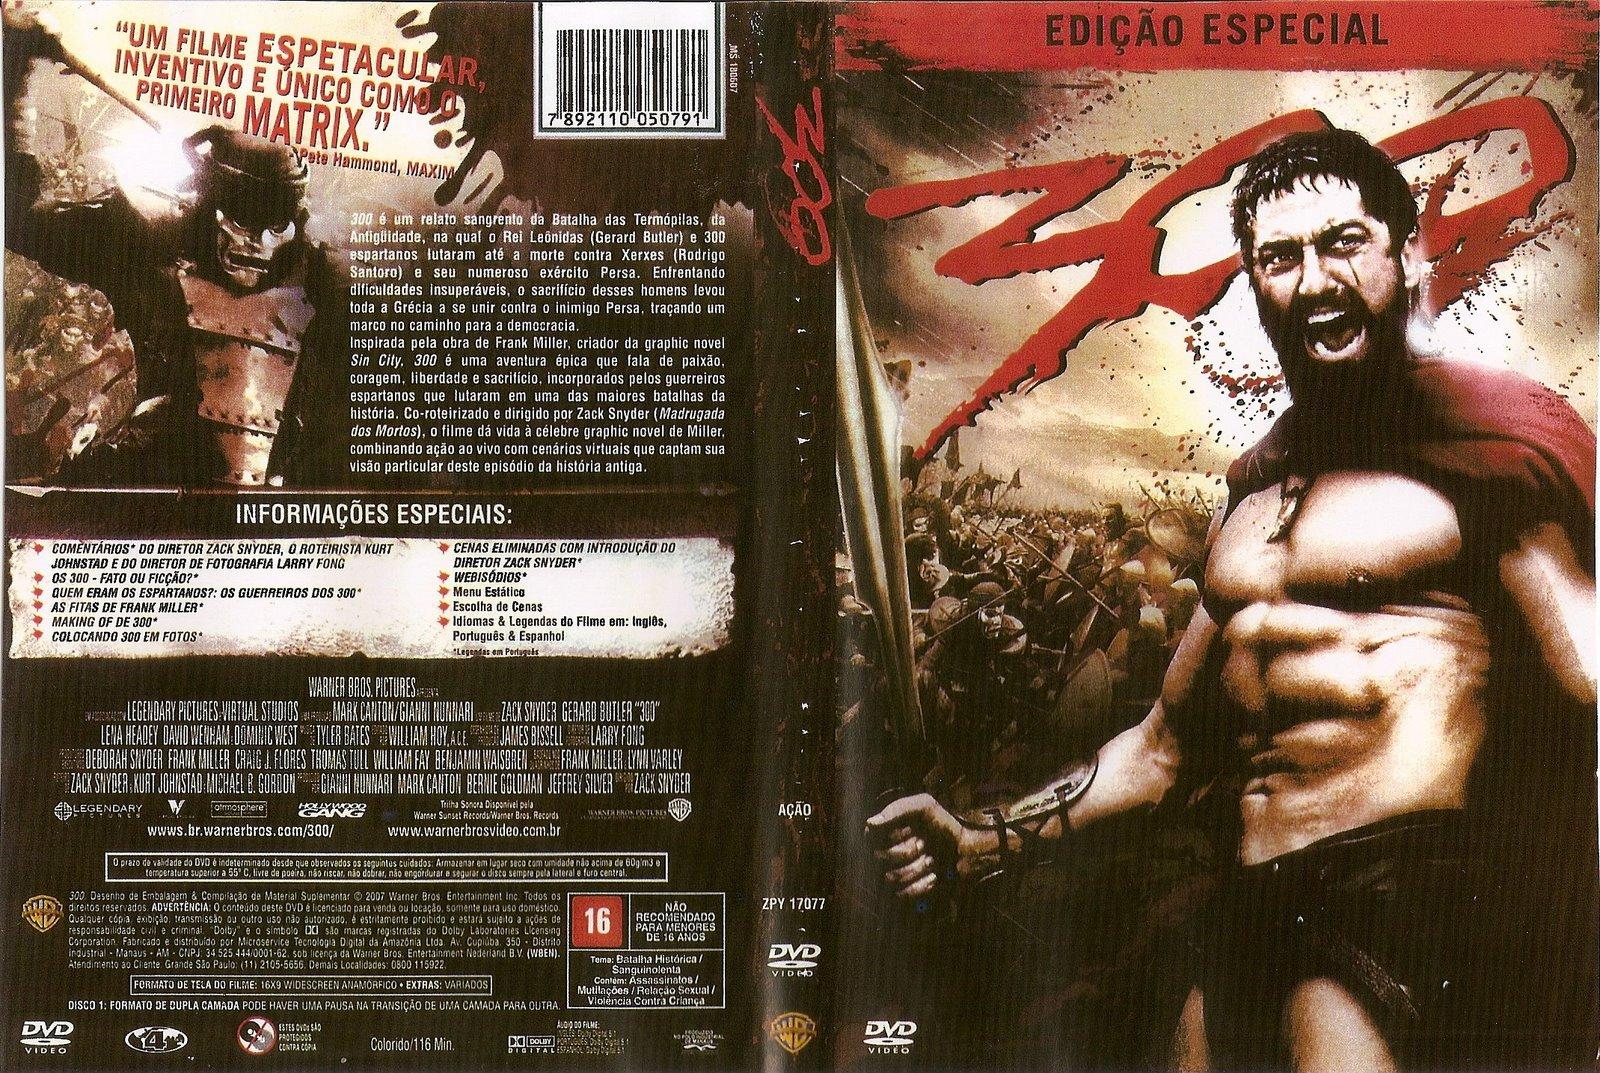 http://2.bp.blogspot.com/_DOFuJeNNuu4/ScDj-GF3SmI/AAAAAAAAACE/a3CKU808R3w/s1600/300+DE+SPARTA+CAPA+DVD.jpg